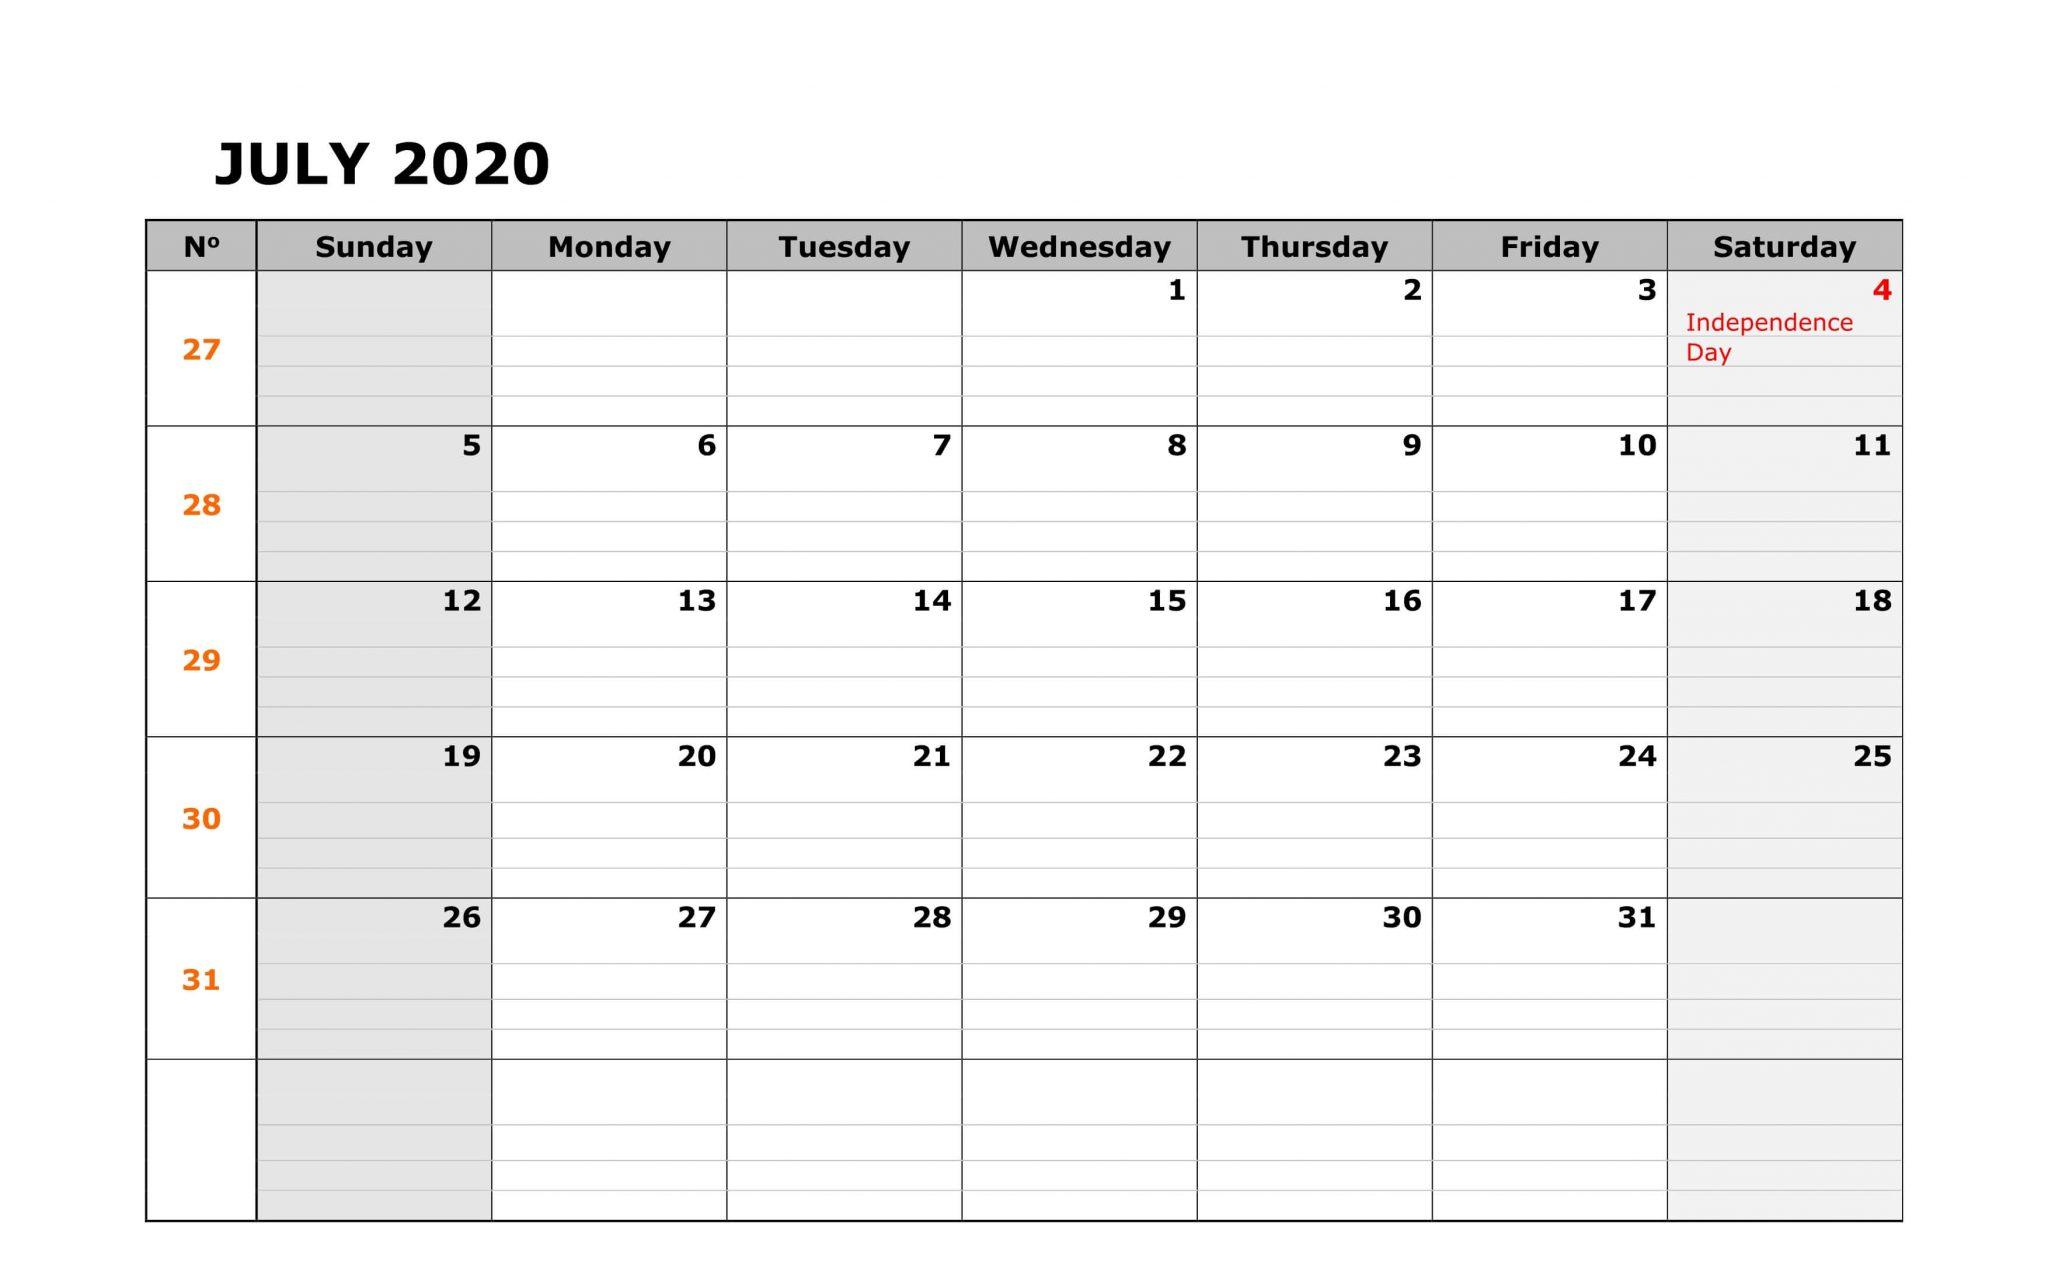 July 2020 Holidays Calendar Template